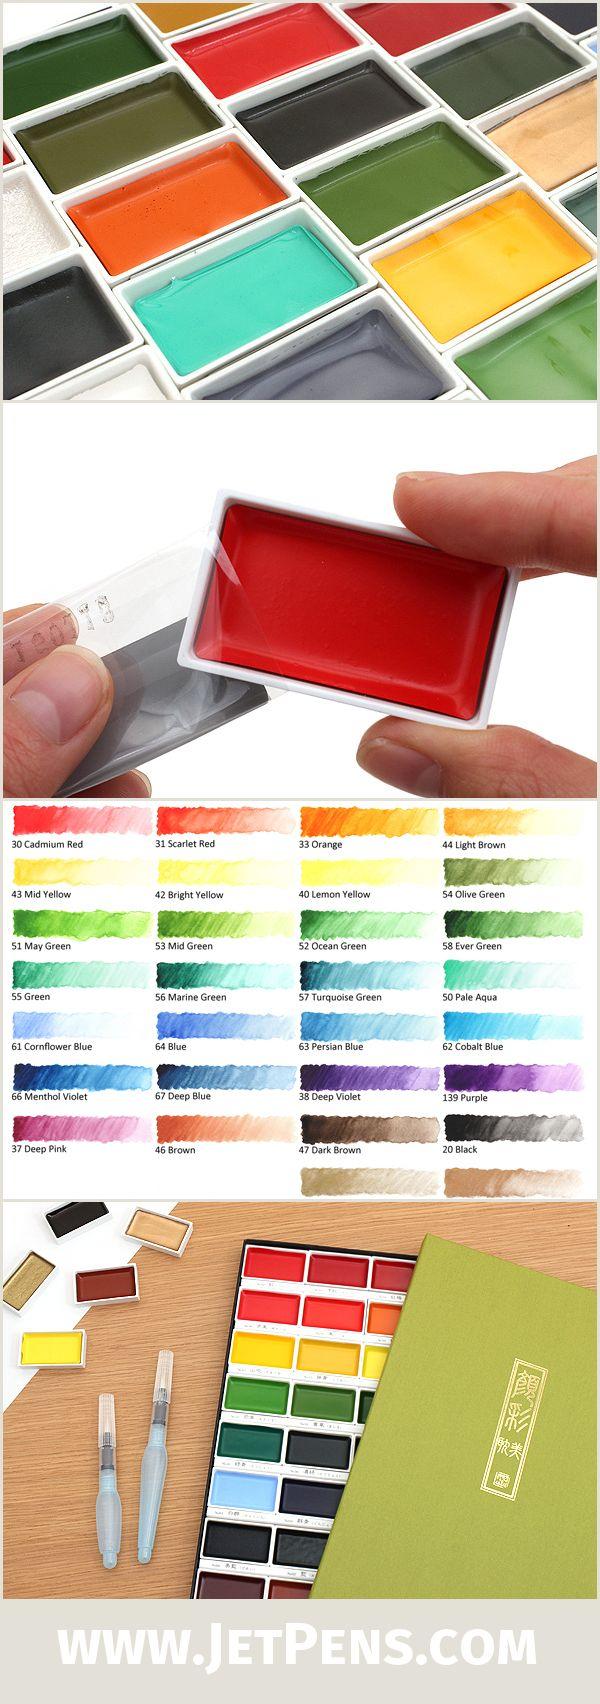 The individual pans of the Kuretake Gansai Tambi Watercolors are now available!